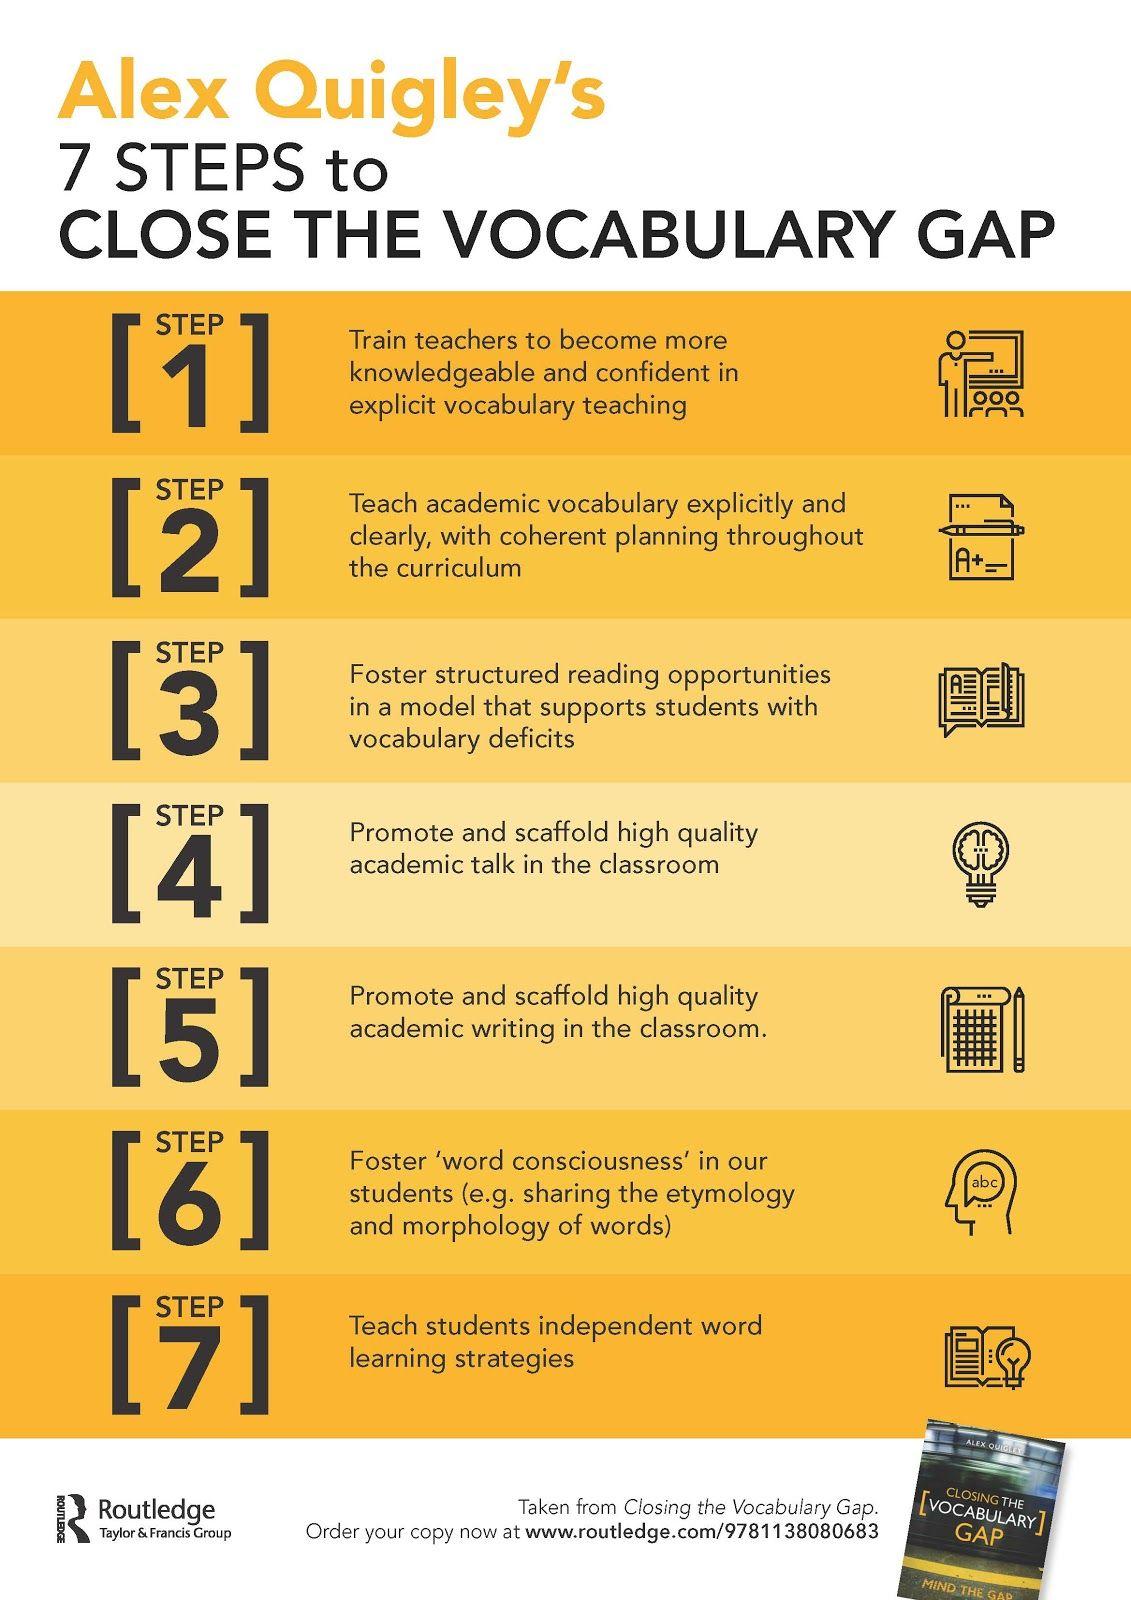 Closing The Vocabulary Gap Resources The Confident Teacher Vocabulary Project Academic Vocabulary Vocabulary Expected reading level grade victoria